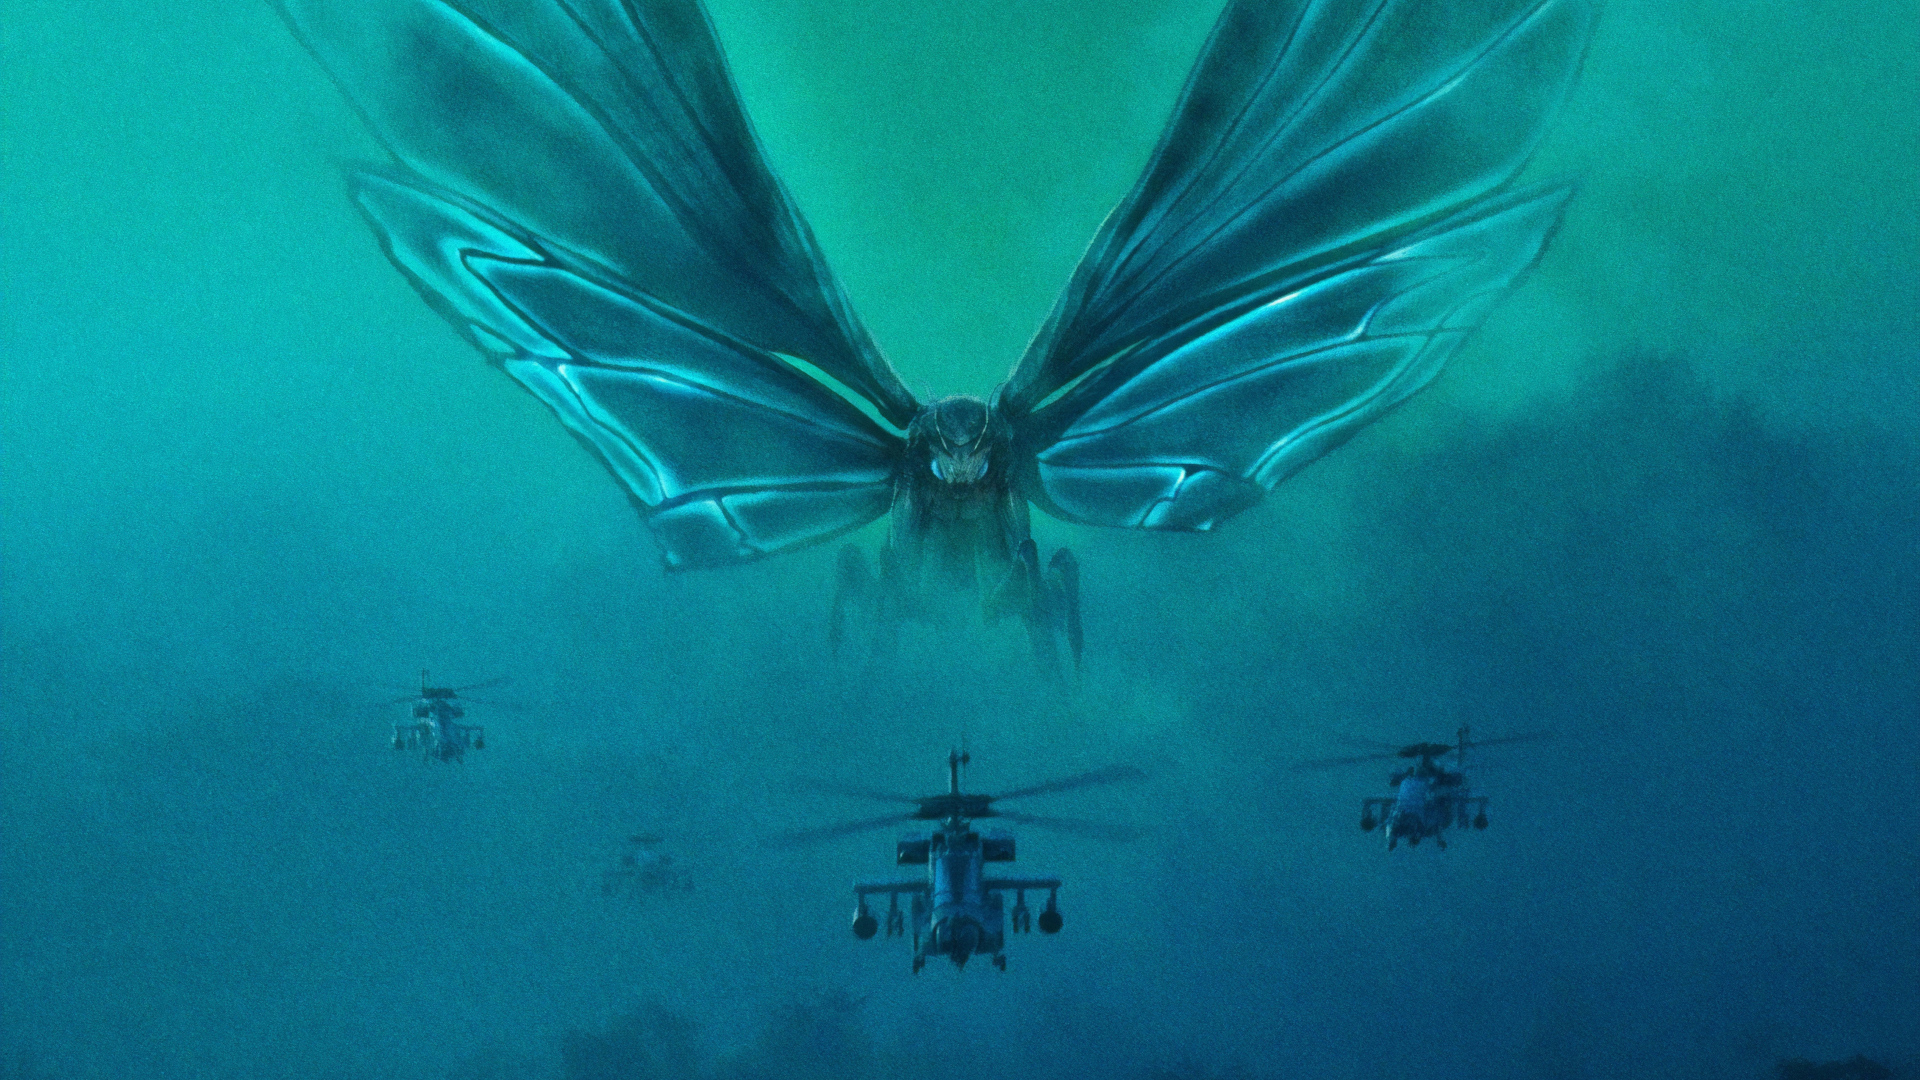 1920x1080 Mothra Godzilla King Of The Monsters 1080p Laptop Full